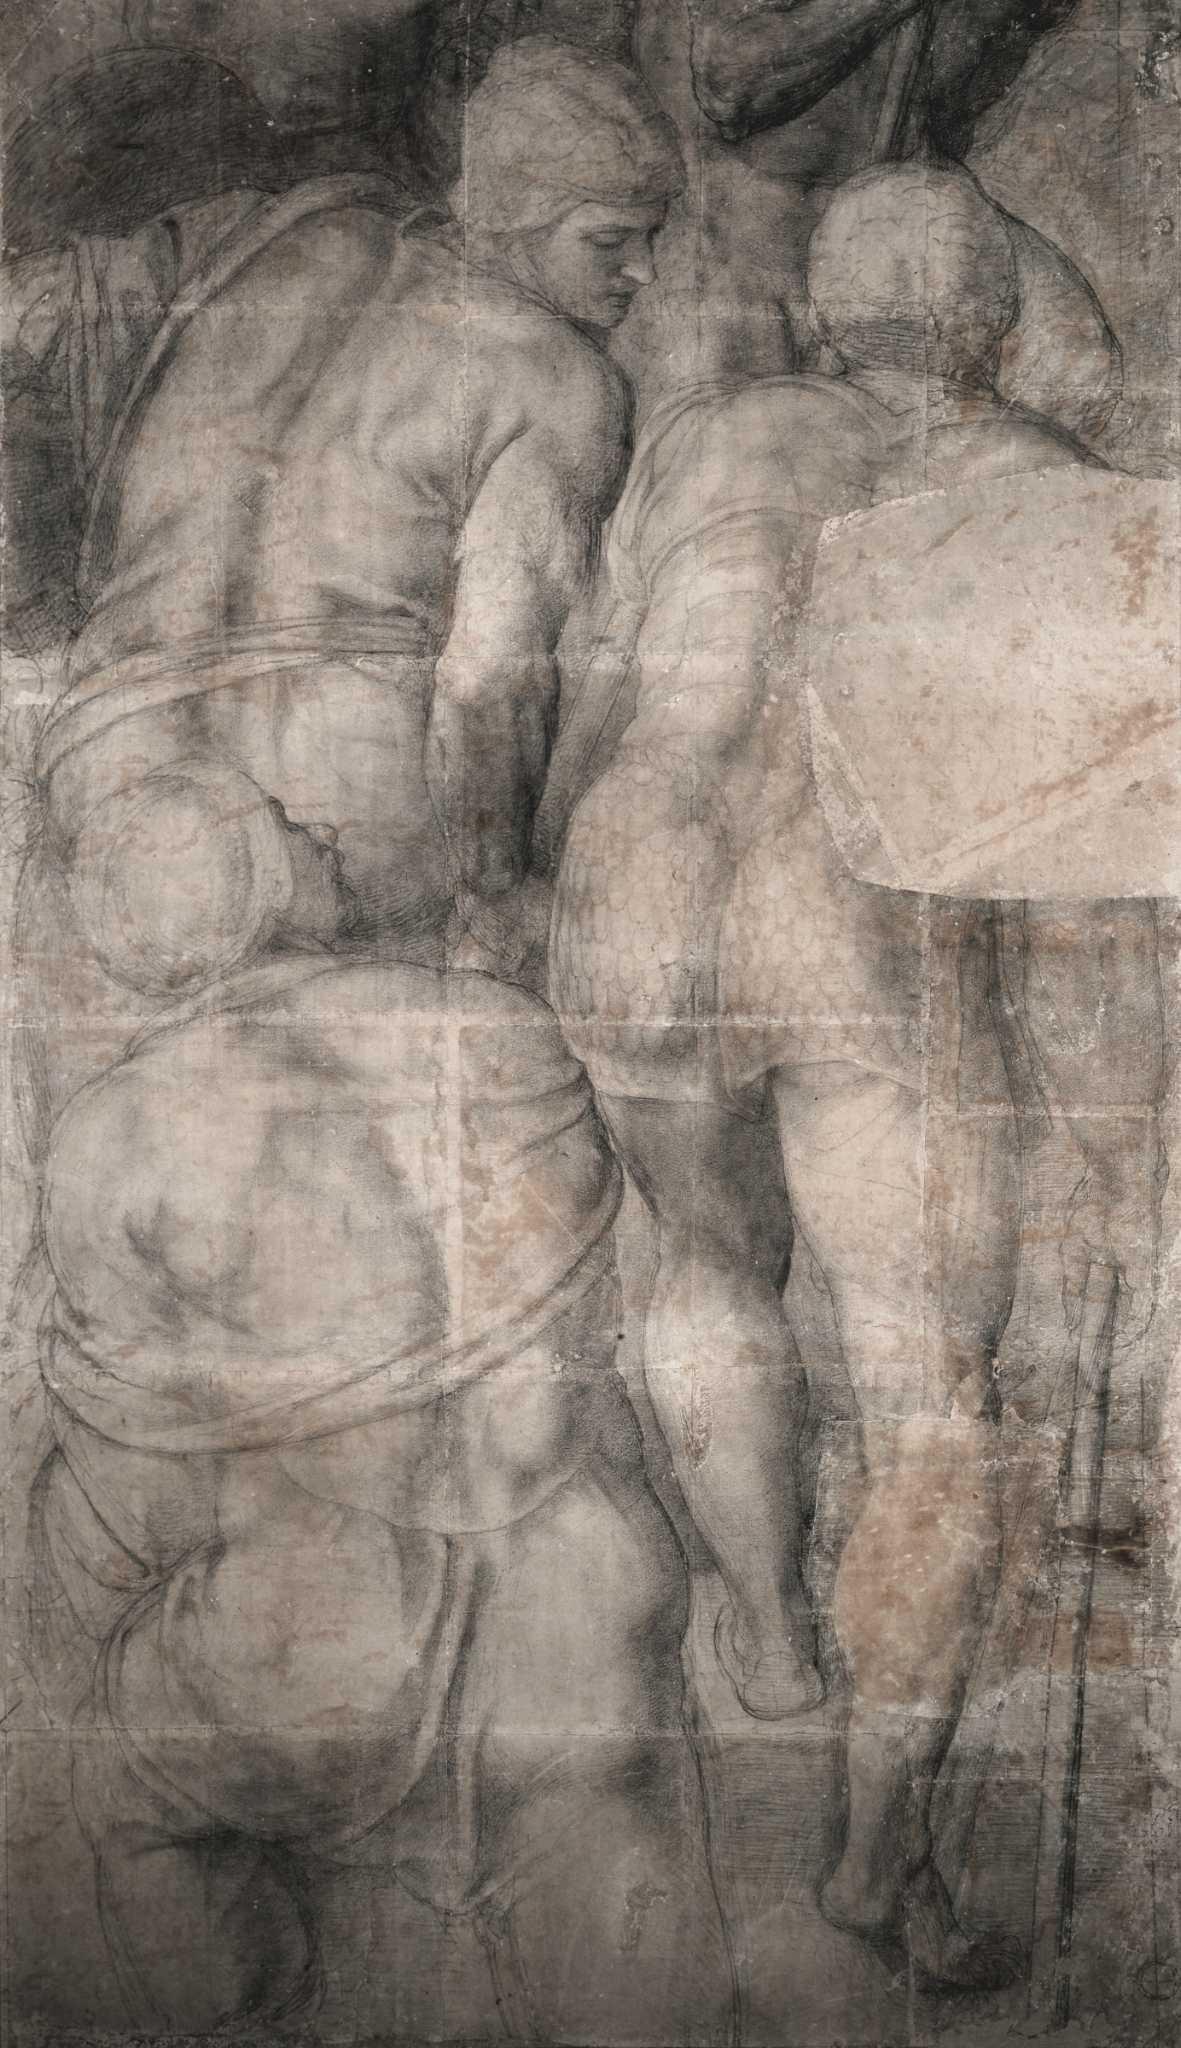 Michelangelo exhibit at Museum of Fine Arts Houston